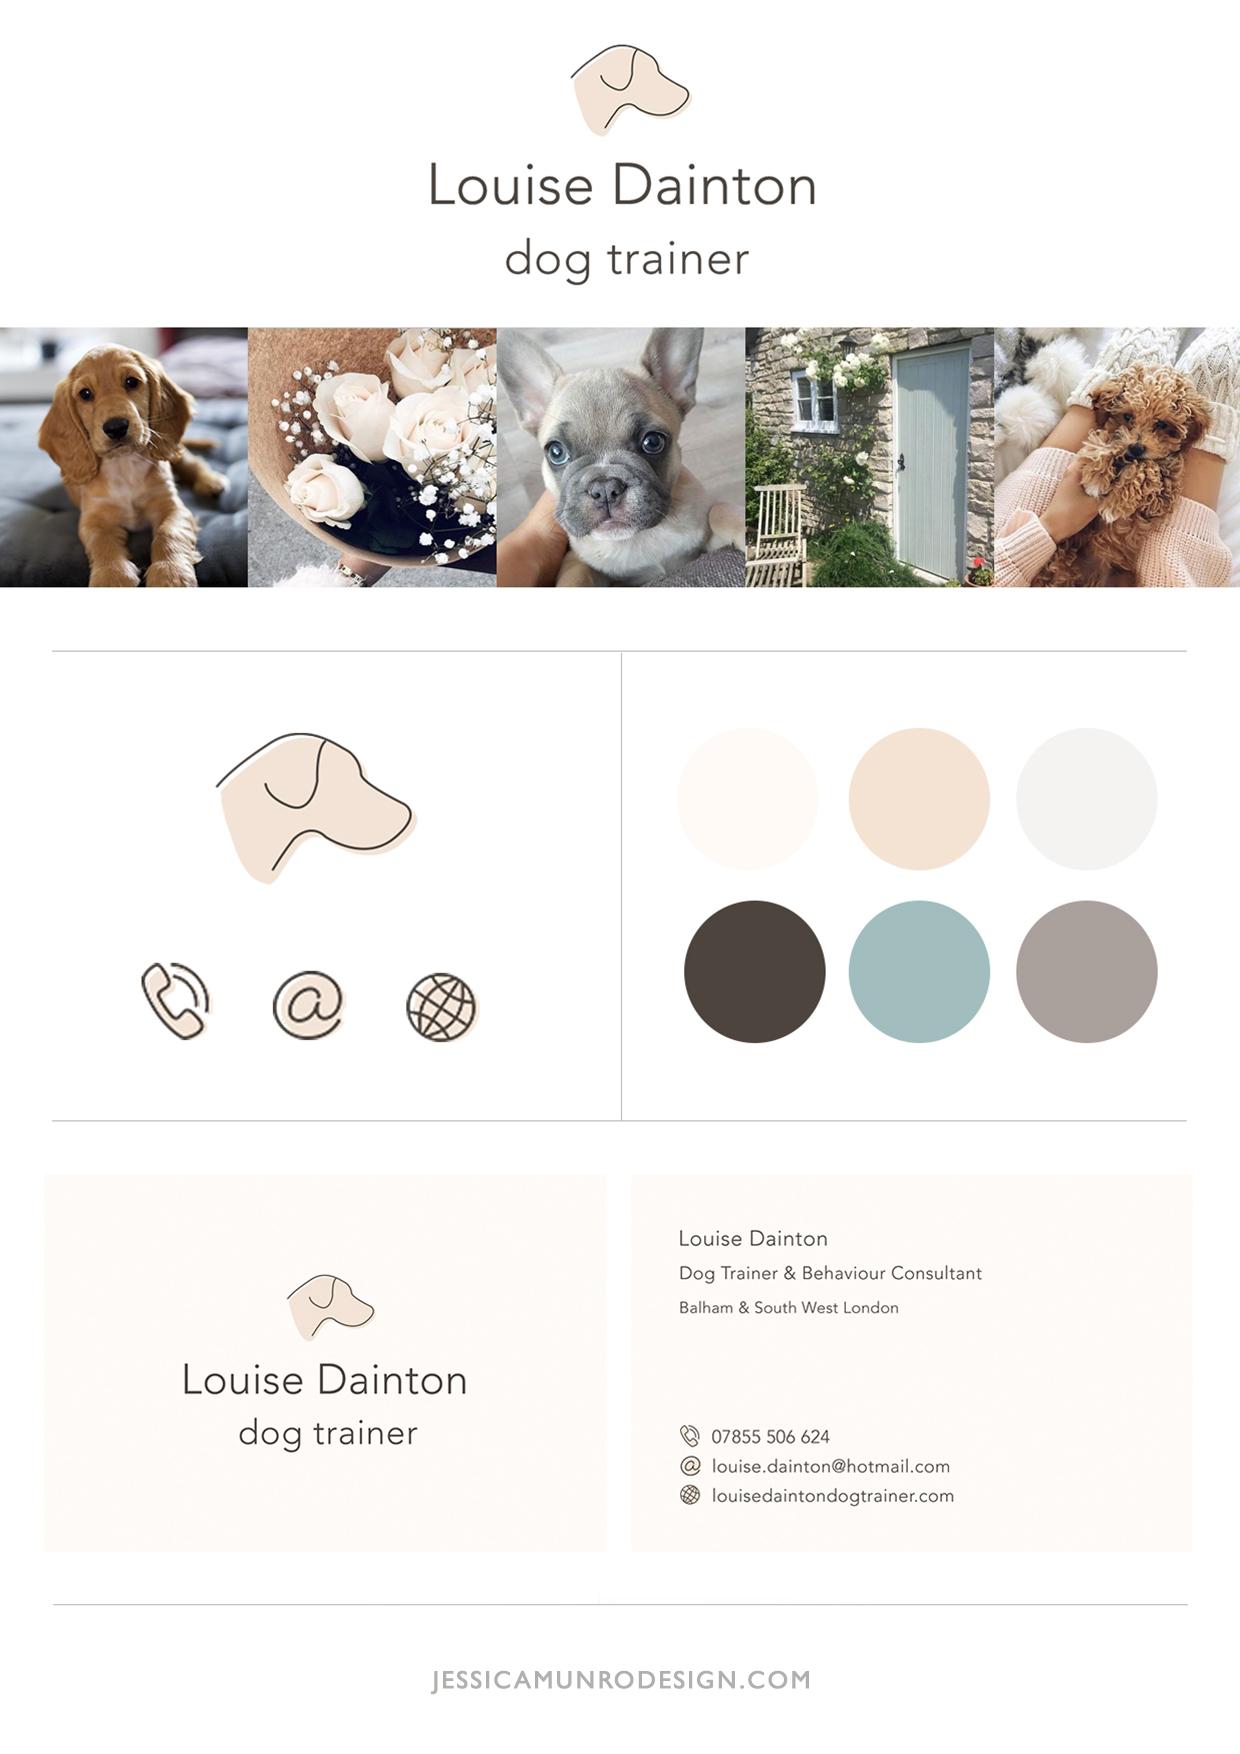 Branding & Web Design — Jessica Munro